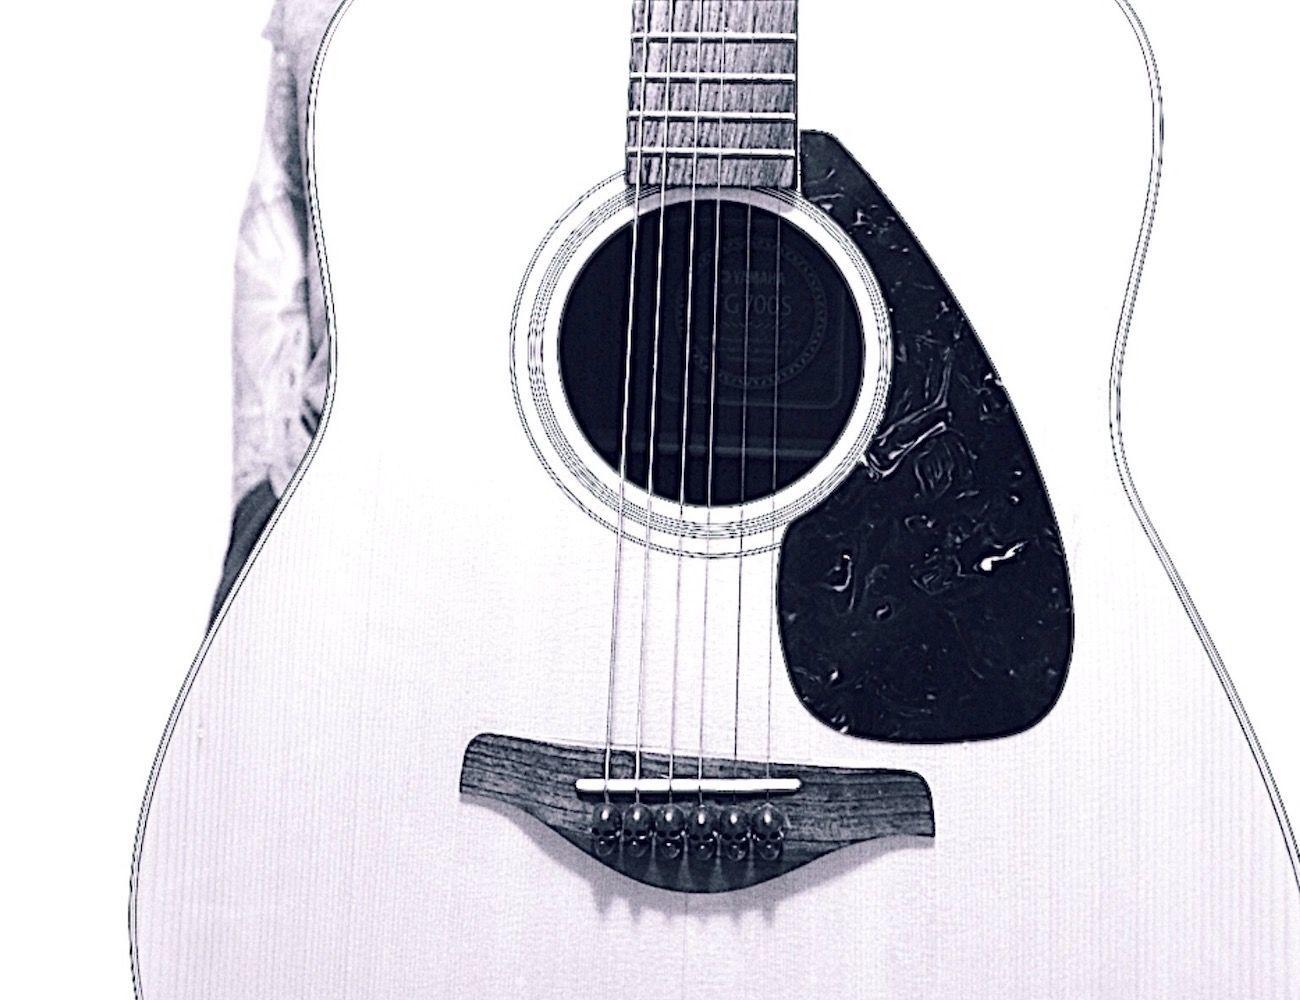 PinHeads Decorative Guitar Bridge Peg Caps